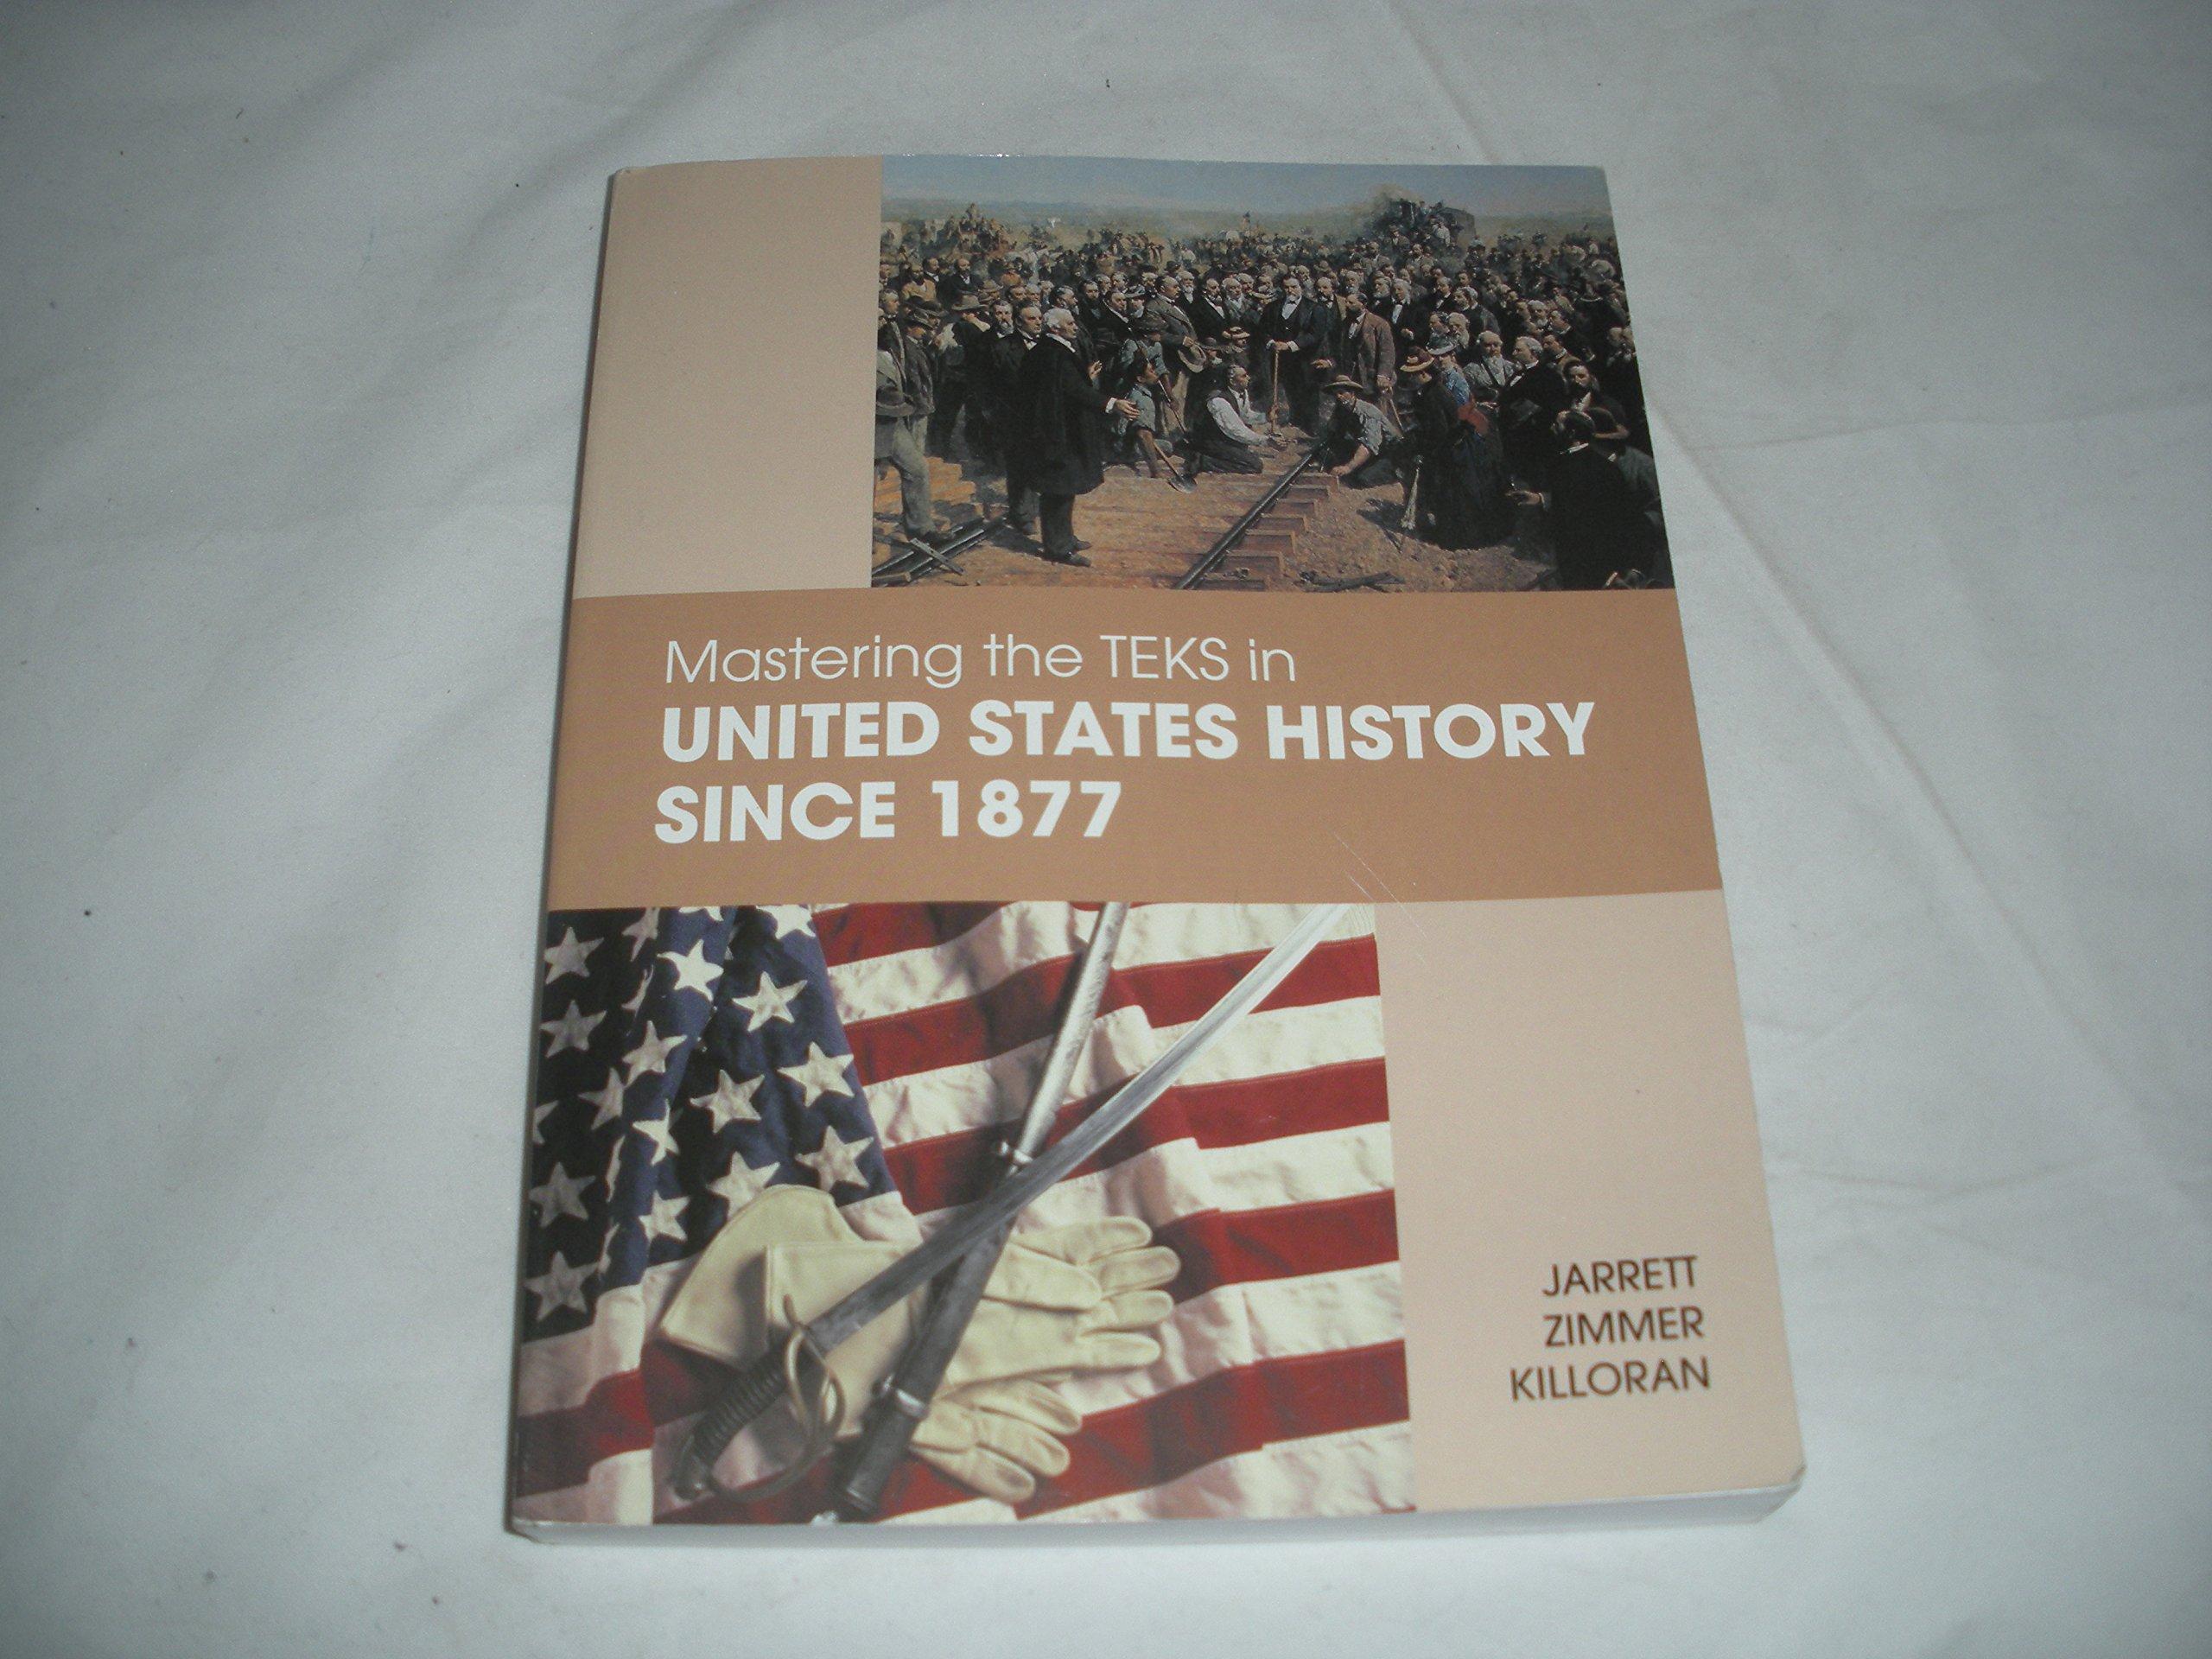 Mastering the TEKS in United States History Since 1877: Mark Jarrett;  Stuart Zimmer; James Zilloran: 9781935022114: Amazon.com: Books